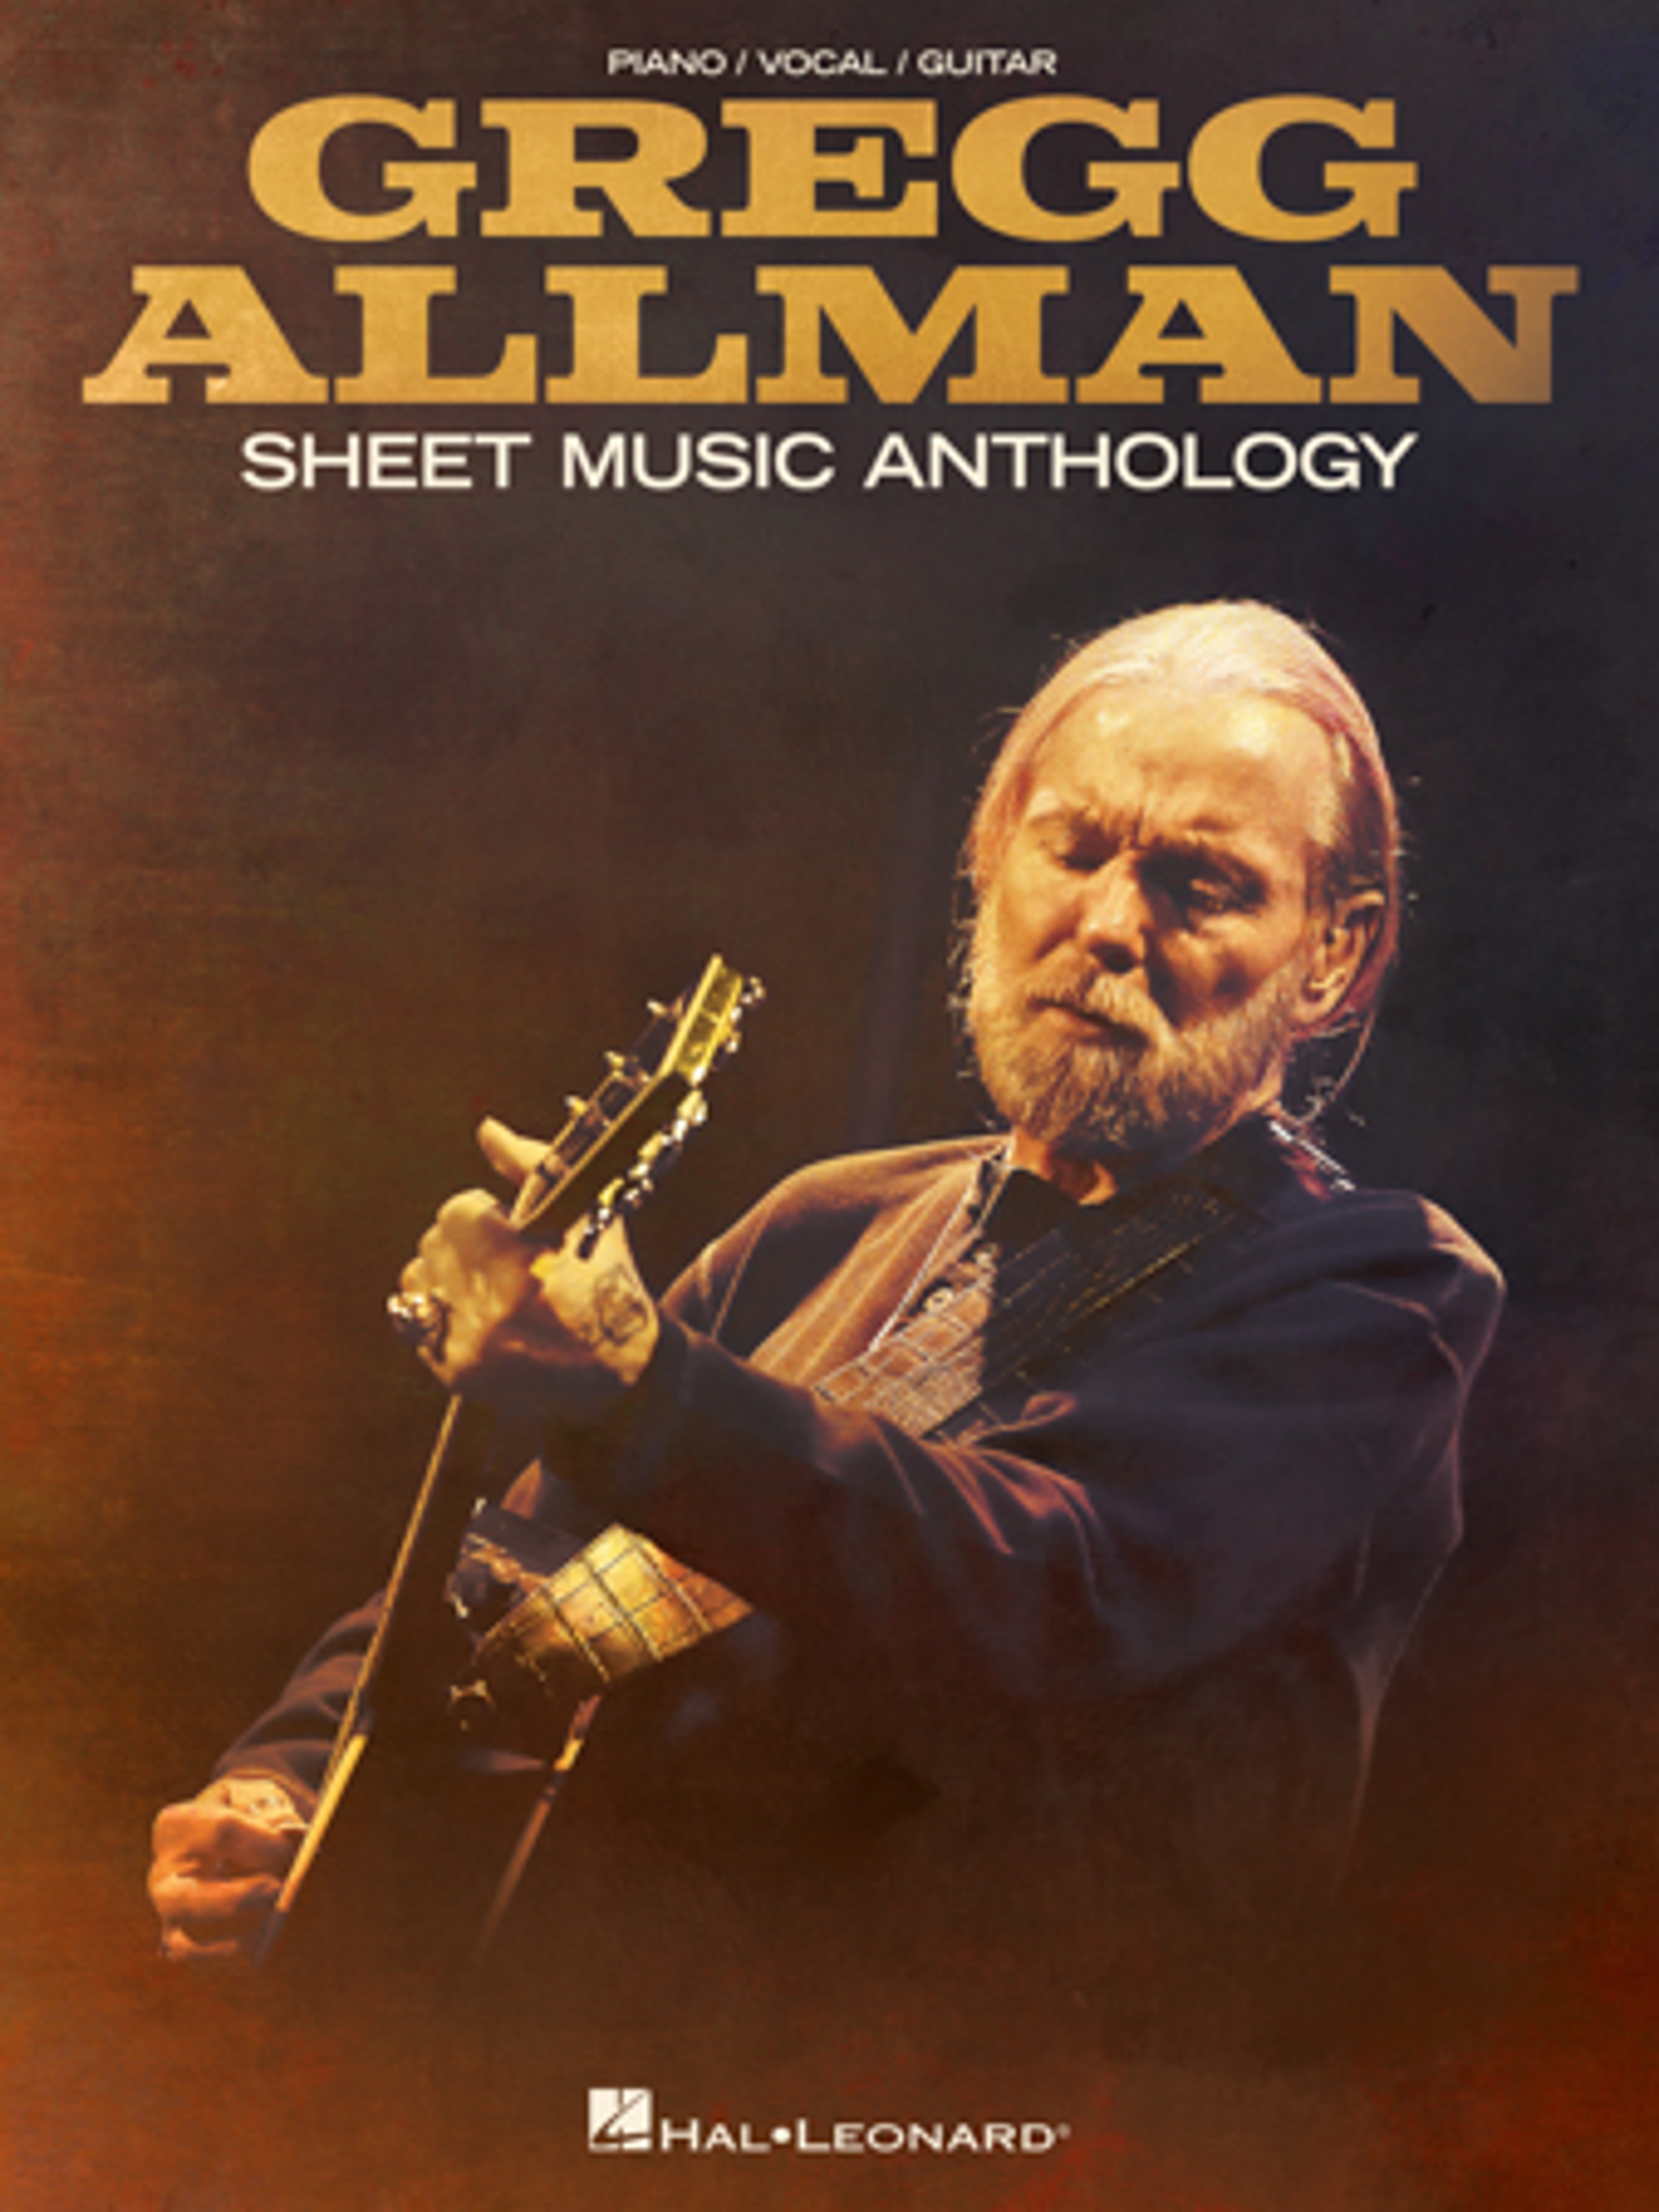 Gregg Allman Sheet Music Anthology